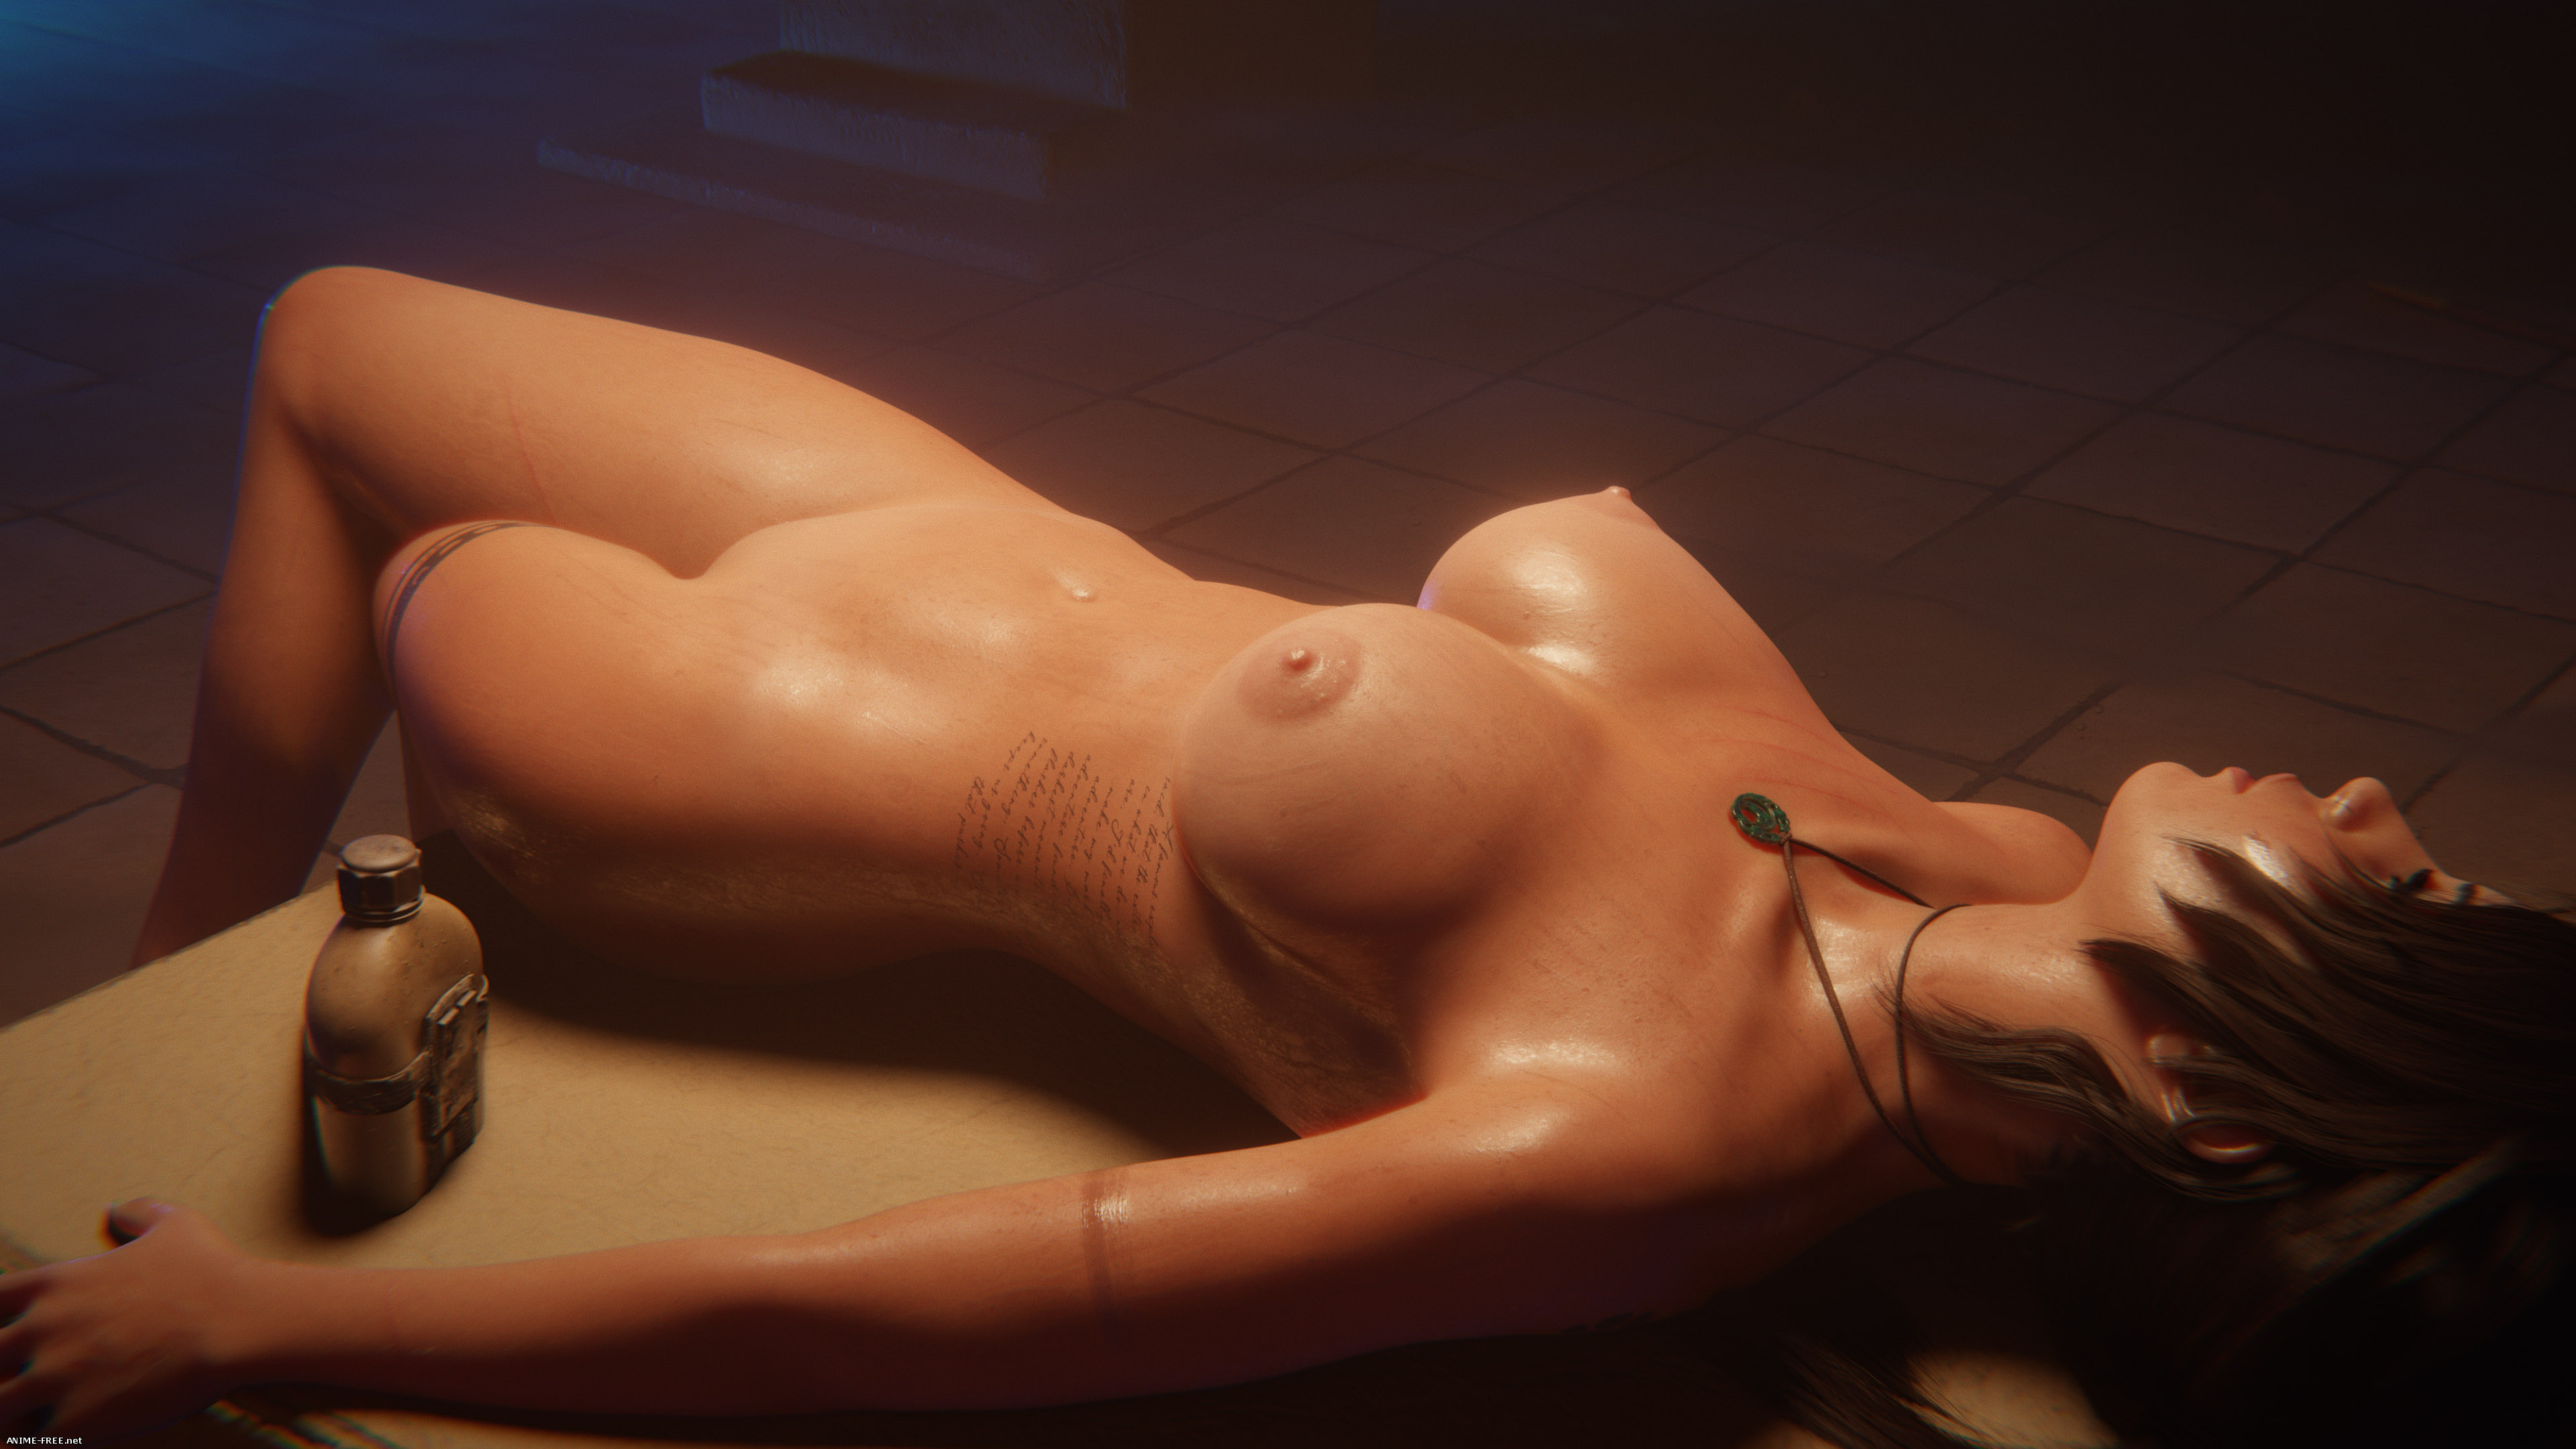 Wildeer studio (ArtWork Collection) - Сборник хентай арта [3DCG] [Uncen] [PNG,JPG] Hentai ART